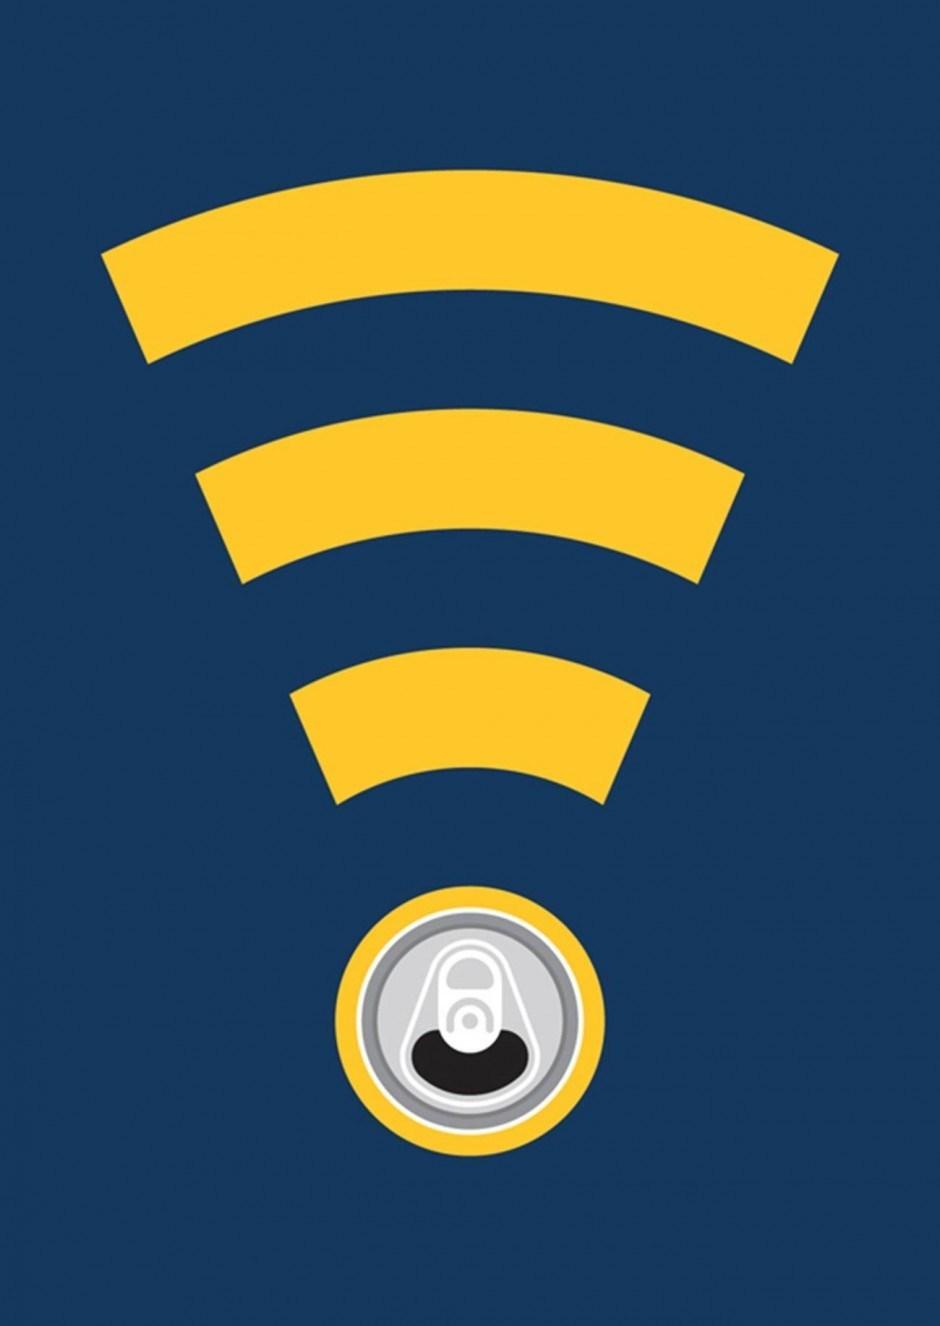 Homeless Wi-Fi Hotspots